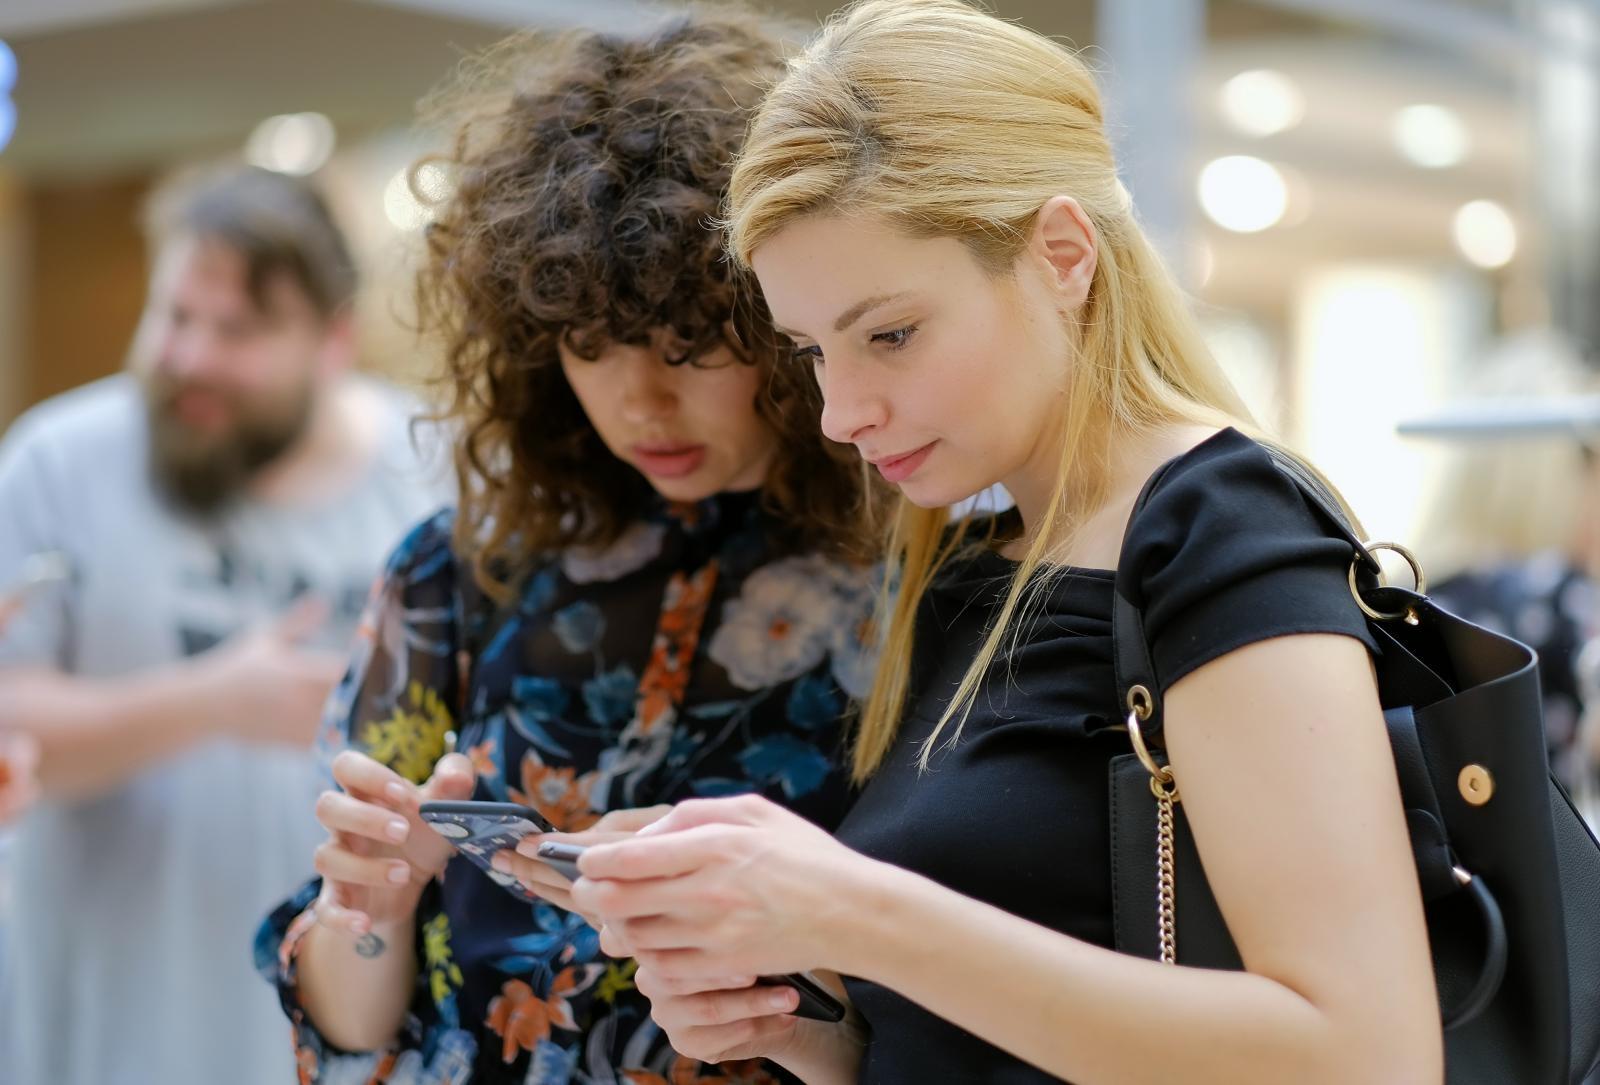 Nakupovanje s telefoni Vir:Pixell